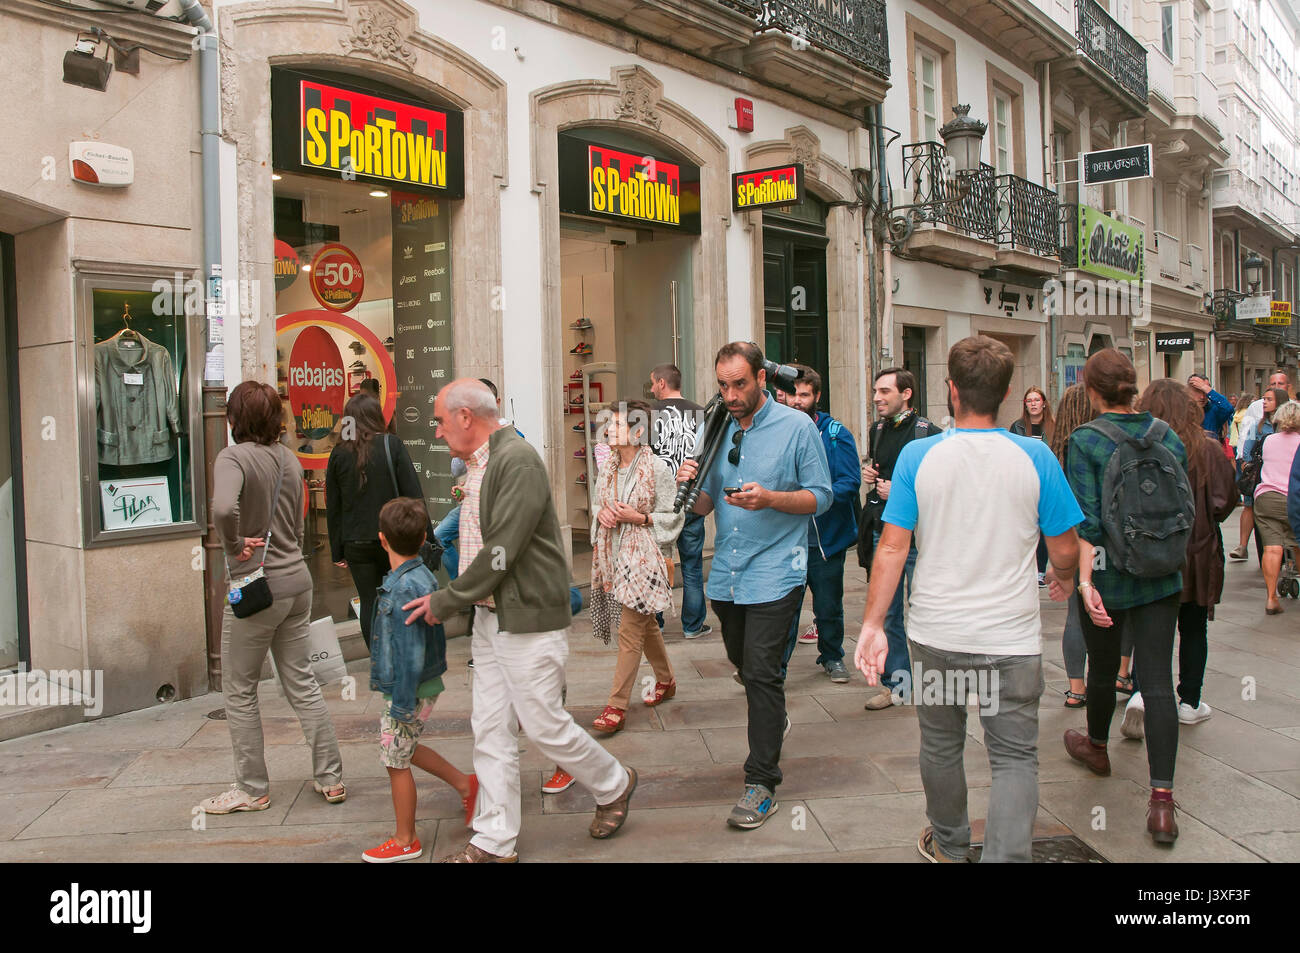 Pedestrian street and people, La Coruna, Region of Galicia, Spain, Europe - Stock Image